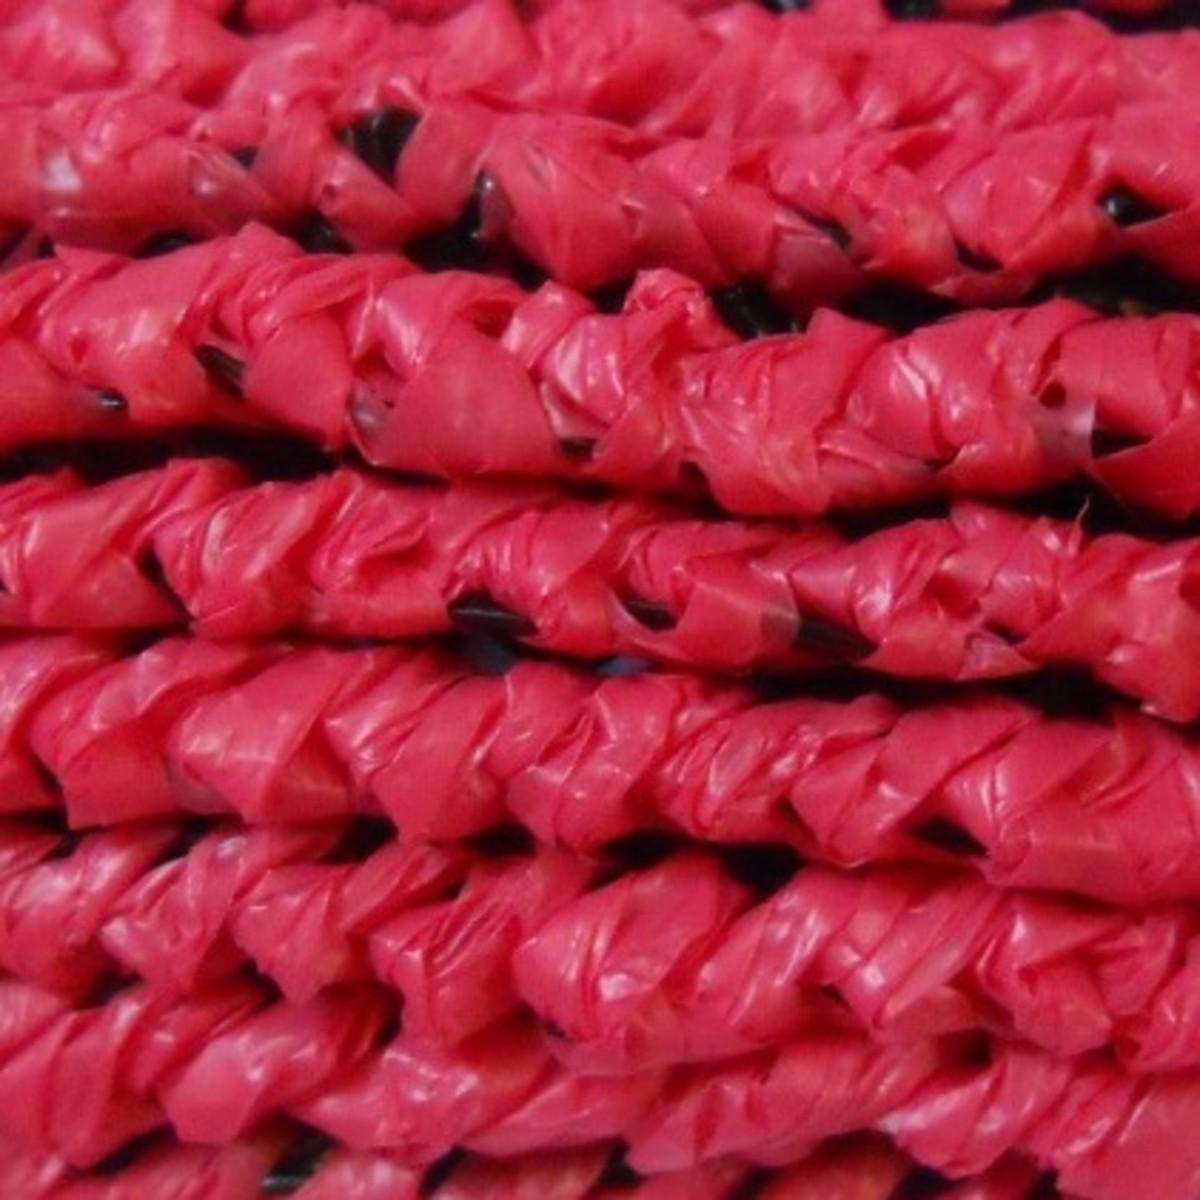 CRAB LINE STITCH PATTERN - Crochet pattern below